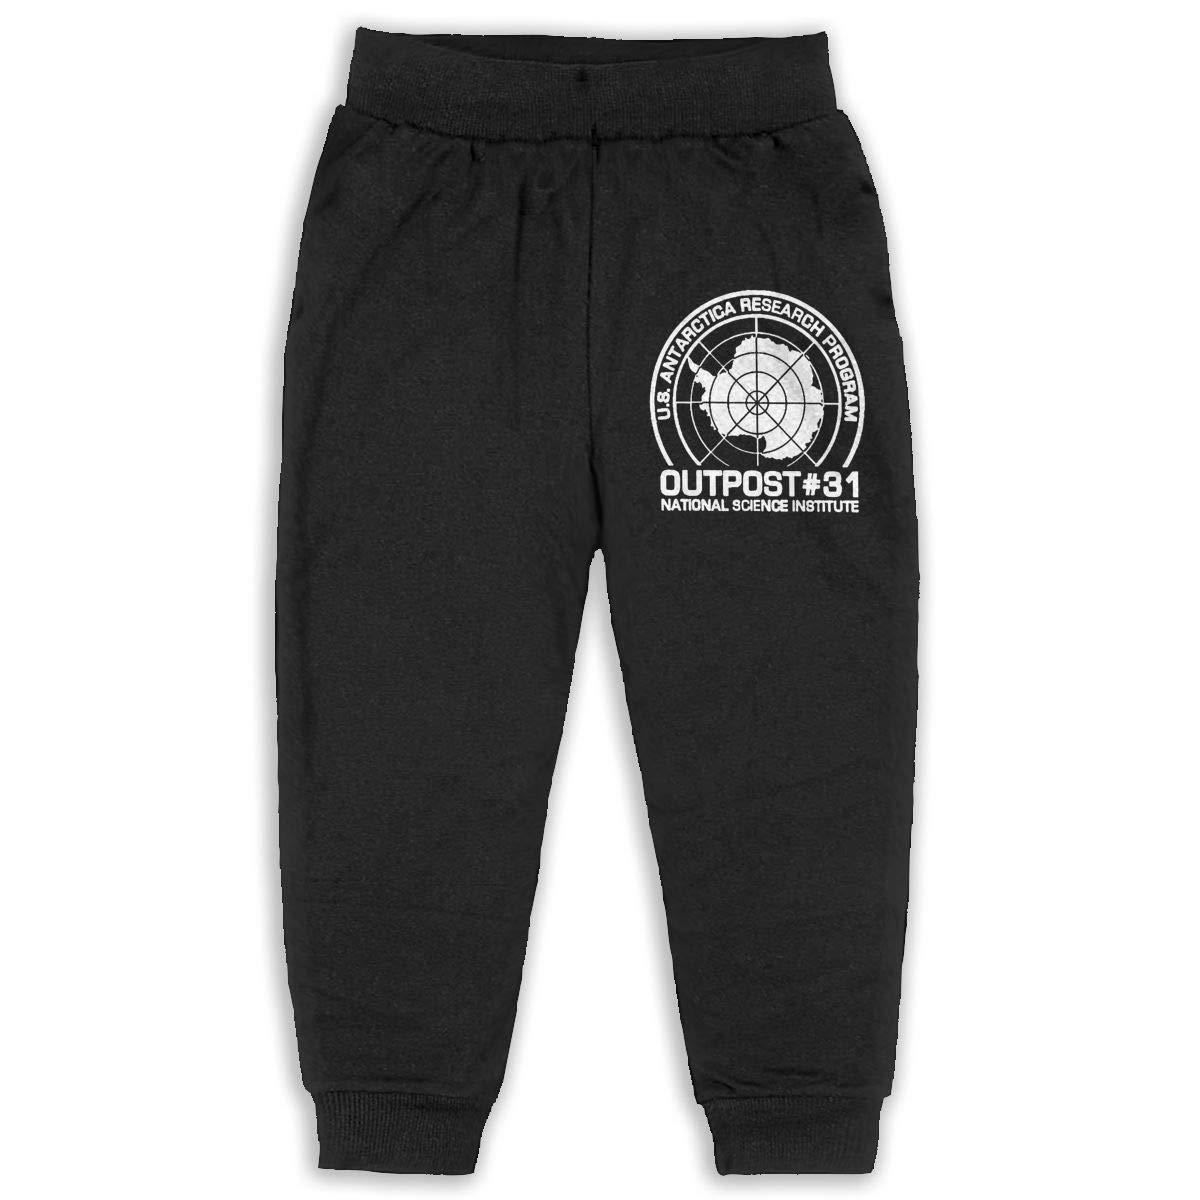 Fleece Active Joggers Elastic Pants DaXi1 Outpost 31 Antarctica Research Sweatpants for Boys /& Girls